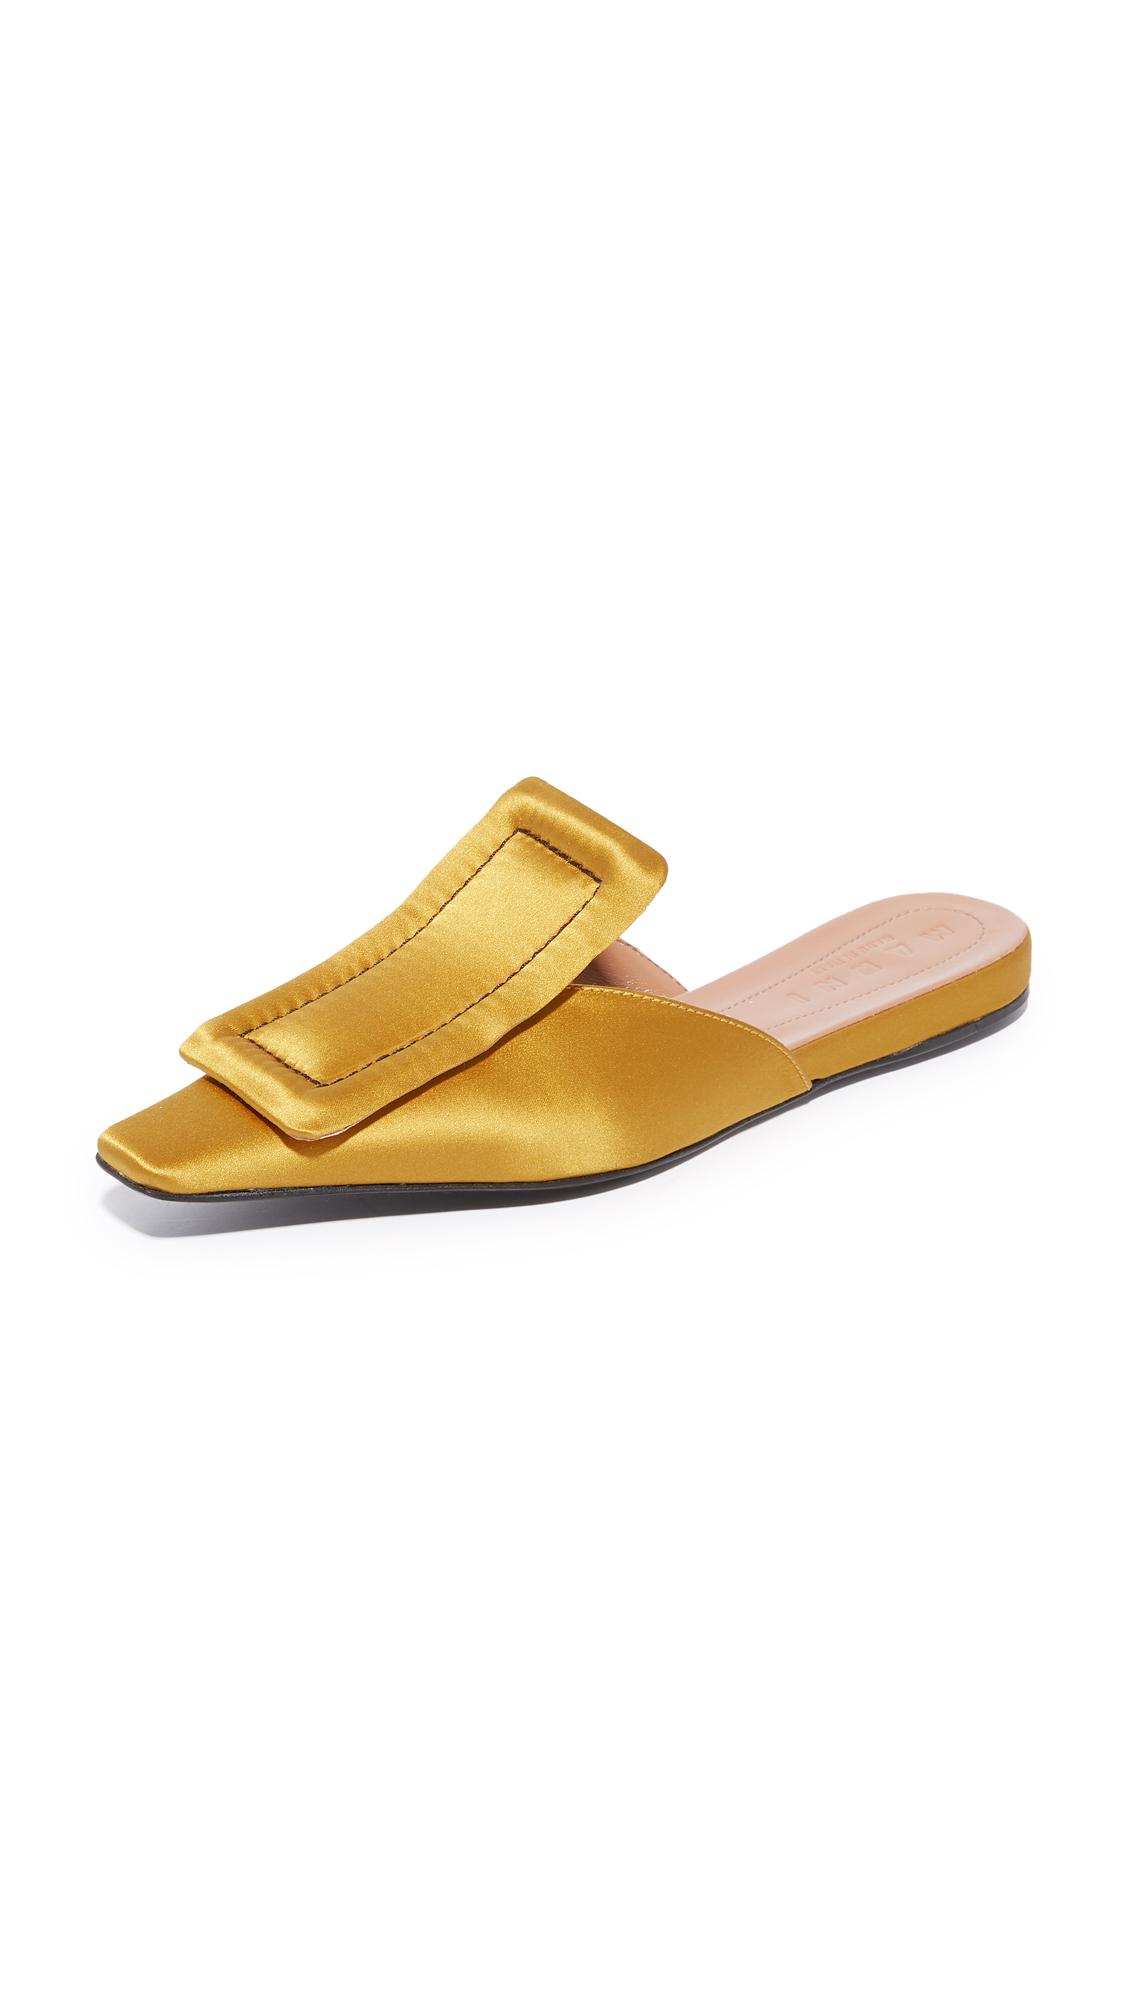 Marni Sabot Mules - Gold